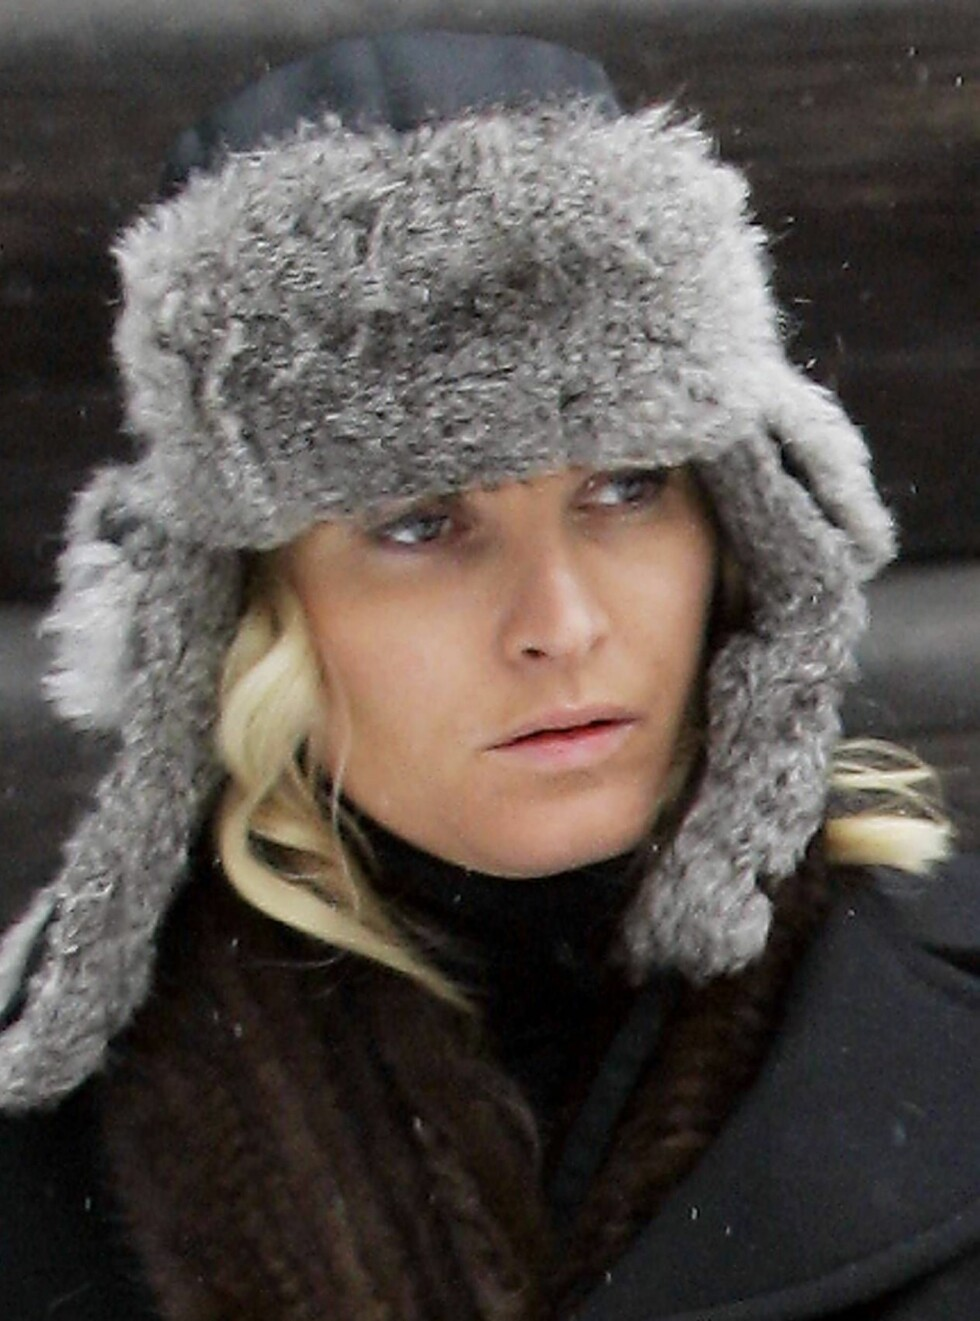 SØRGER: Mette-Marit dro i går til Søgne for å sørge sammen med familien. Foto: SCANPIX